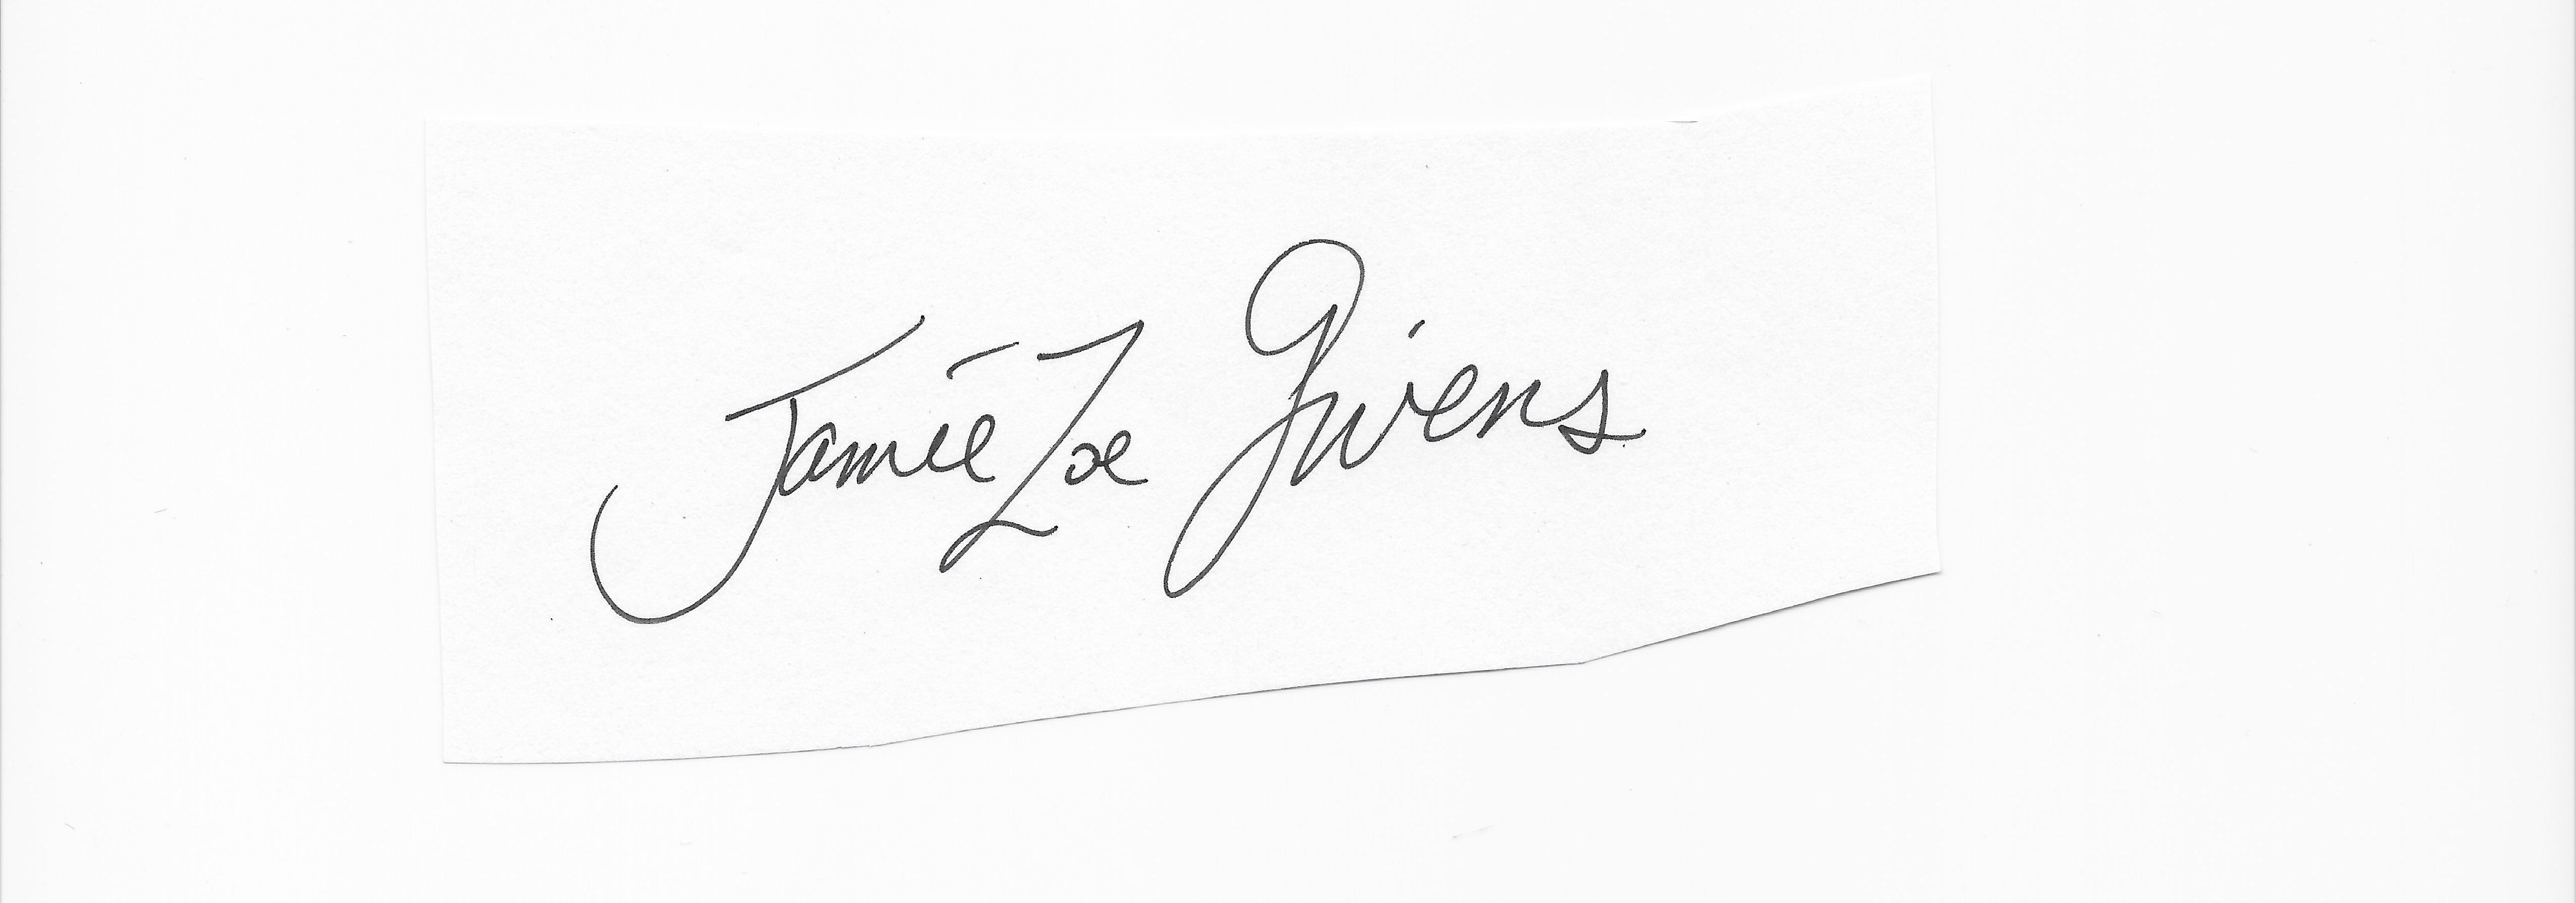 jamie Zoe givens Signature